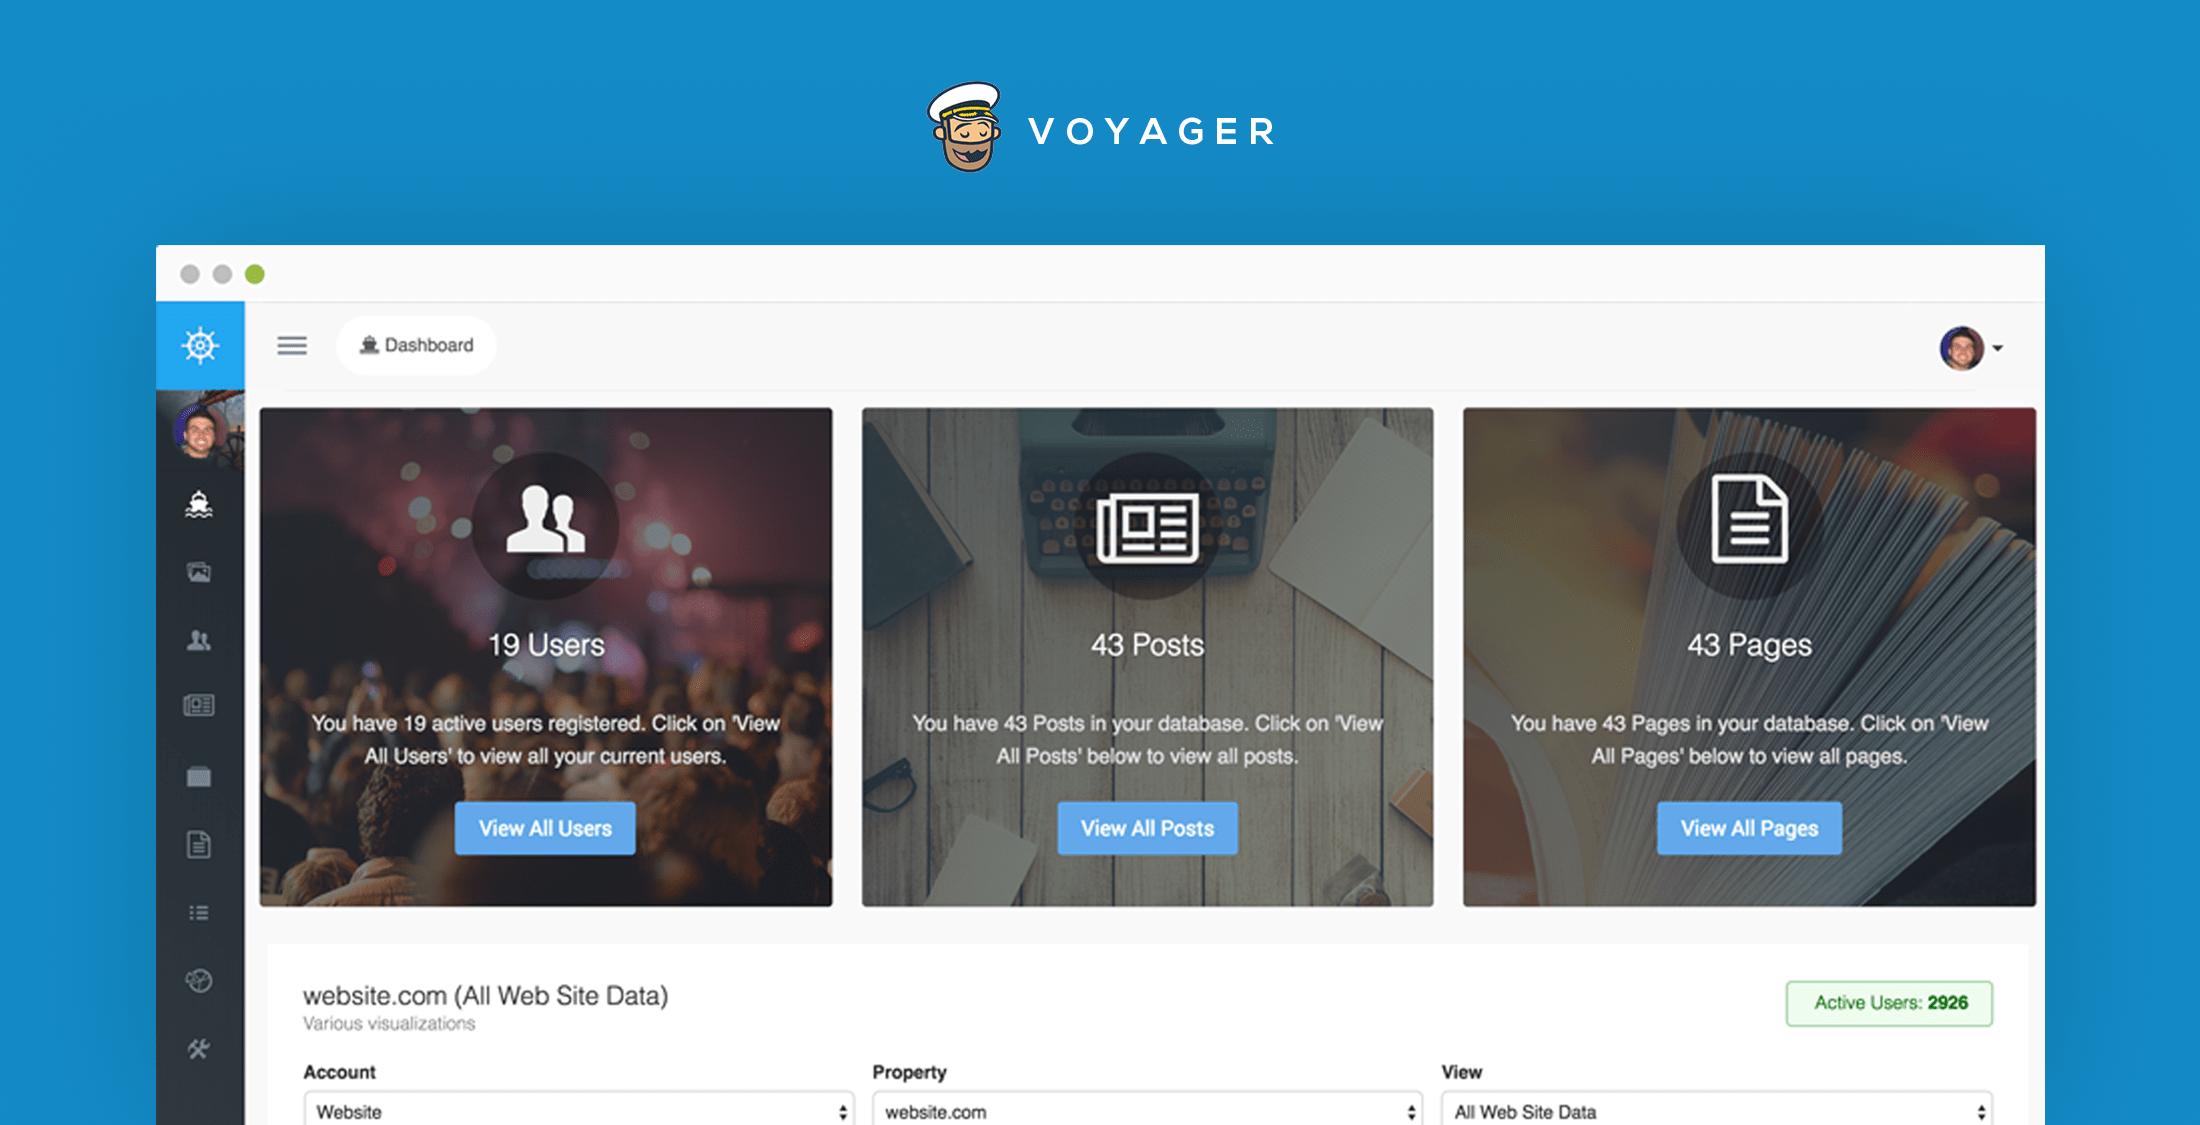 Voyager 1.0